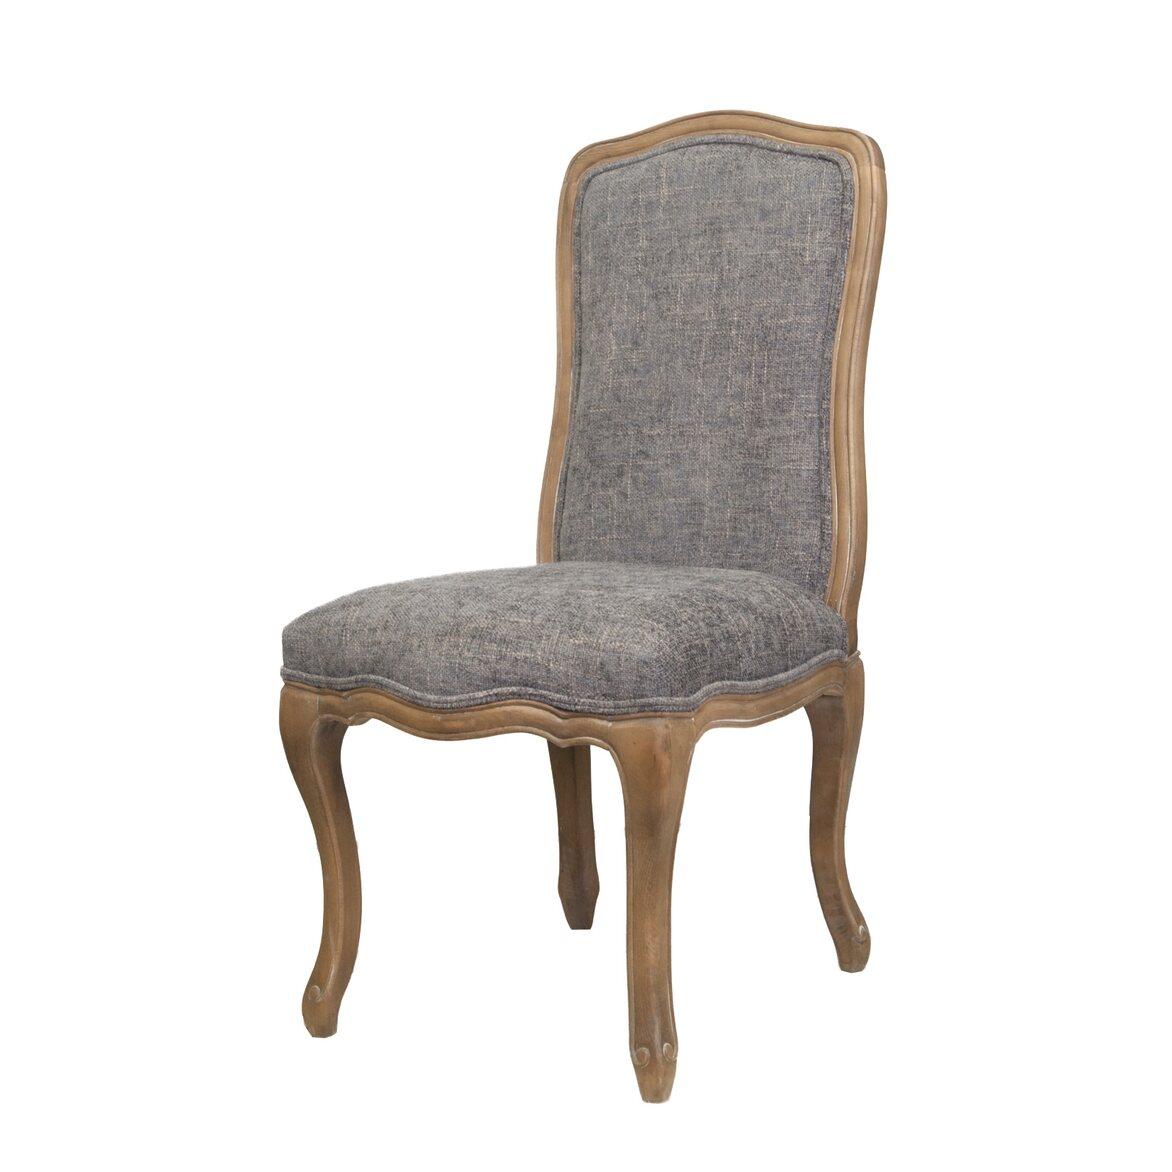 Стул Wenter 4 | Обеденные стулья Kingsby